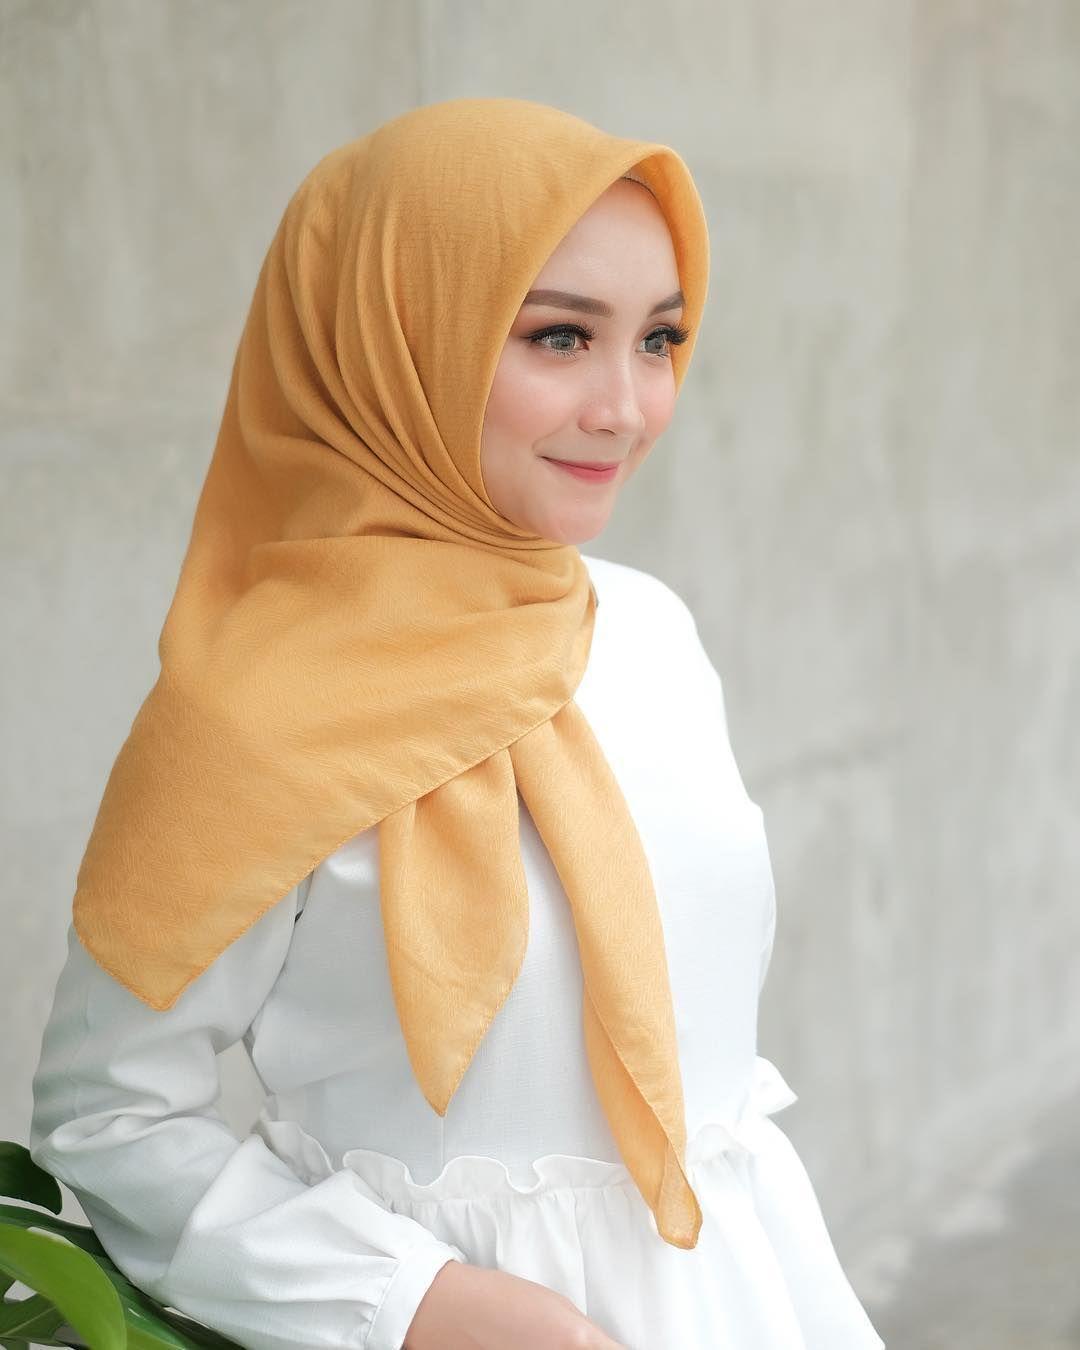 5 Tutorial Hijab Segi Empat a la Selebgram untuk Menghadiri Pesta